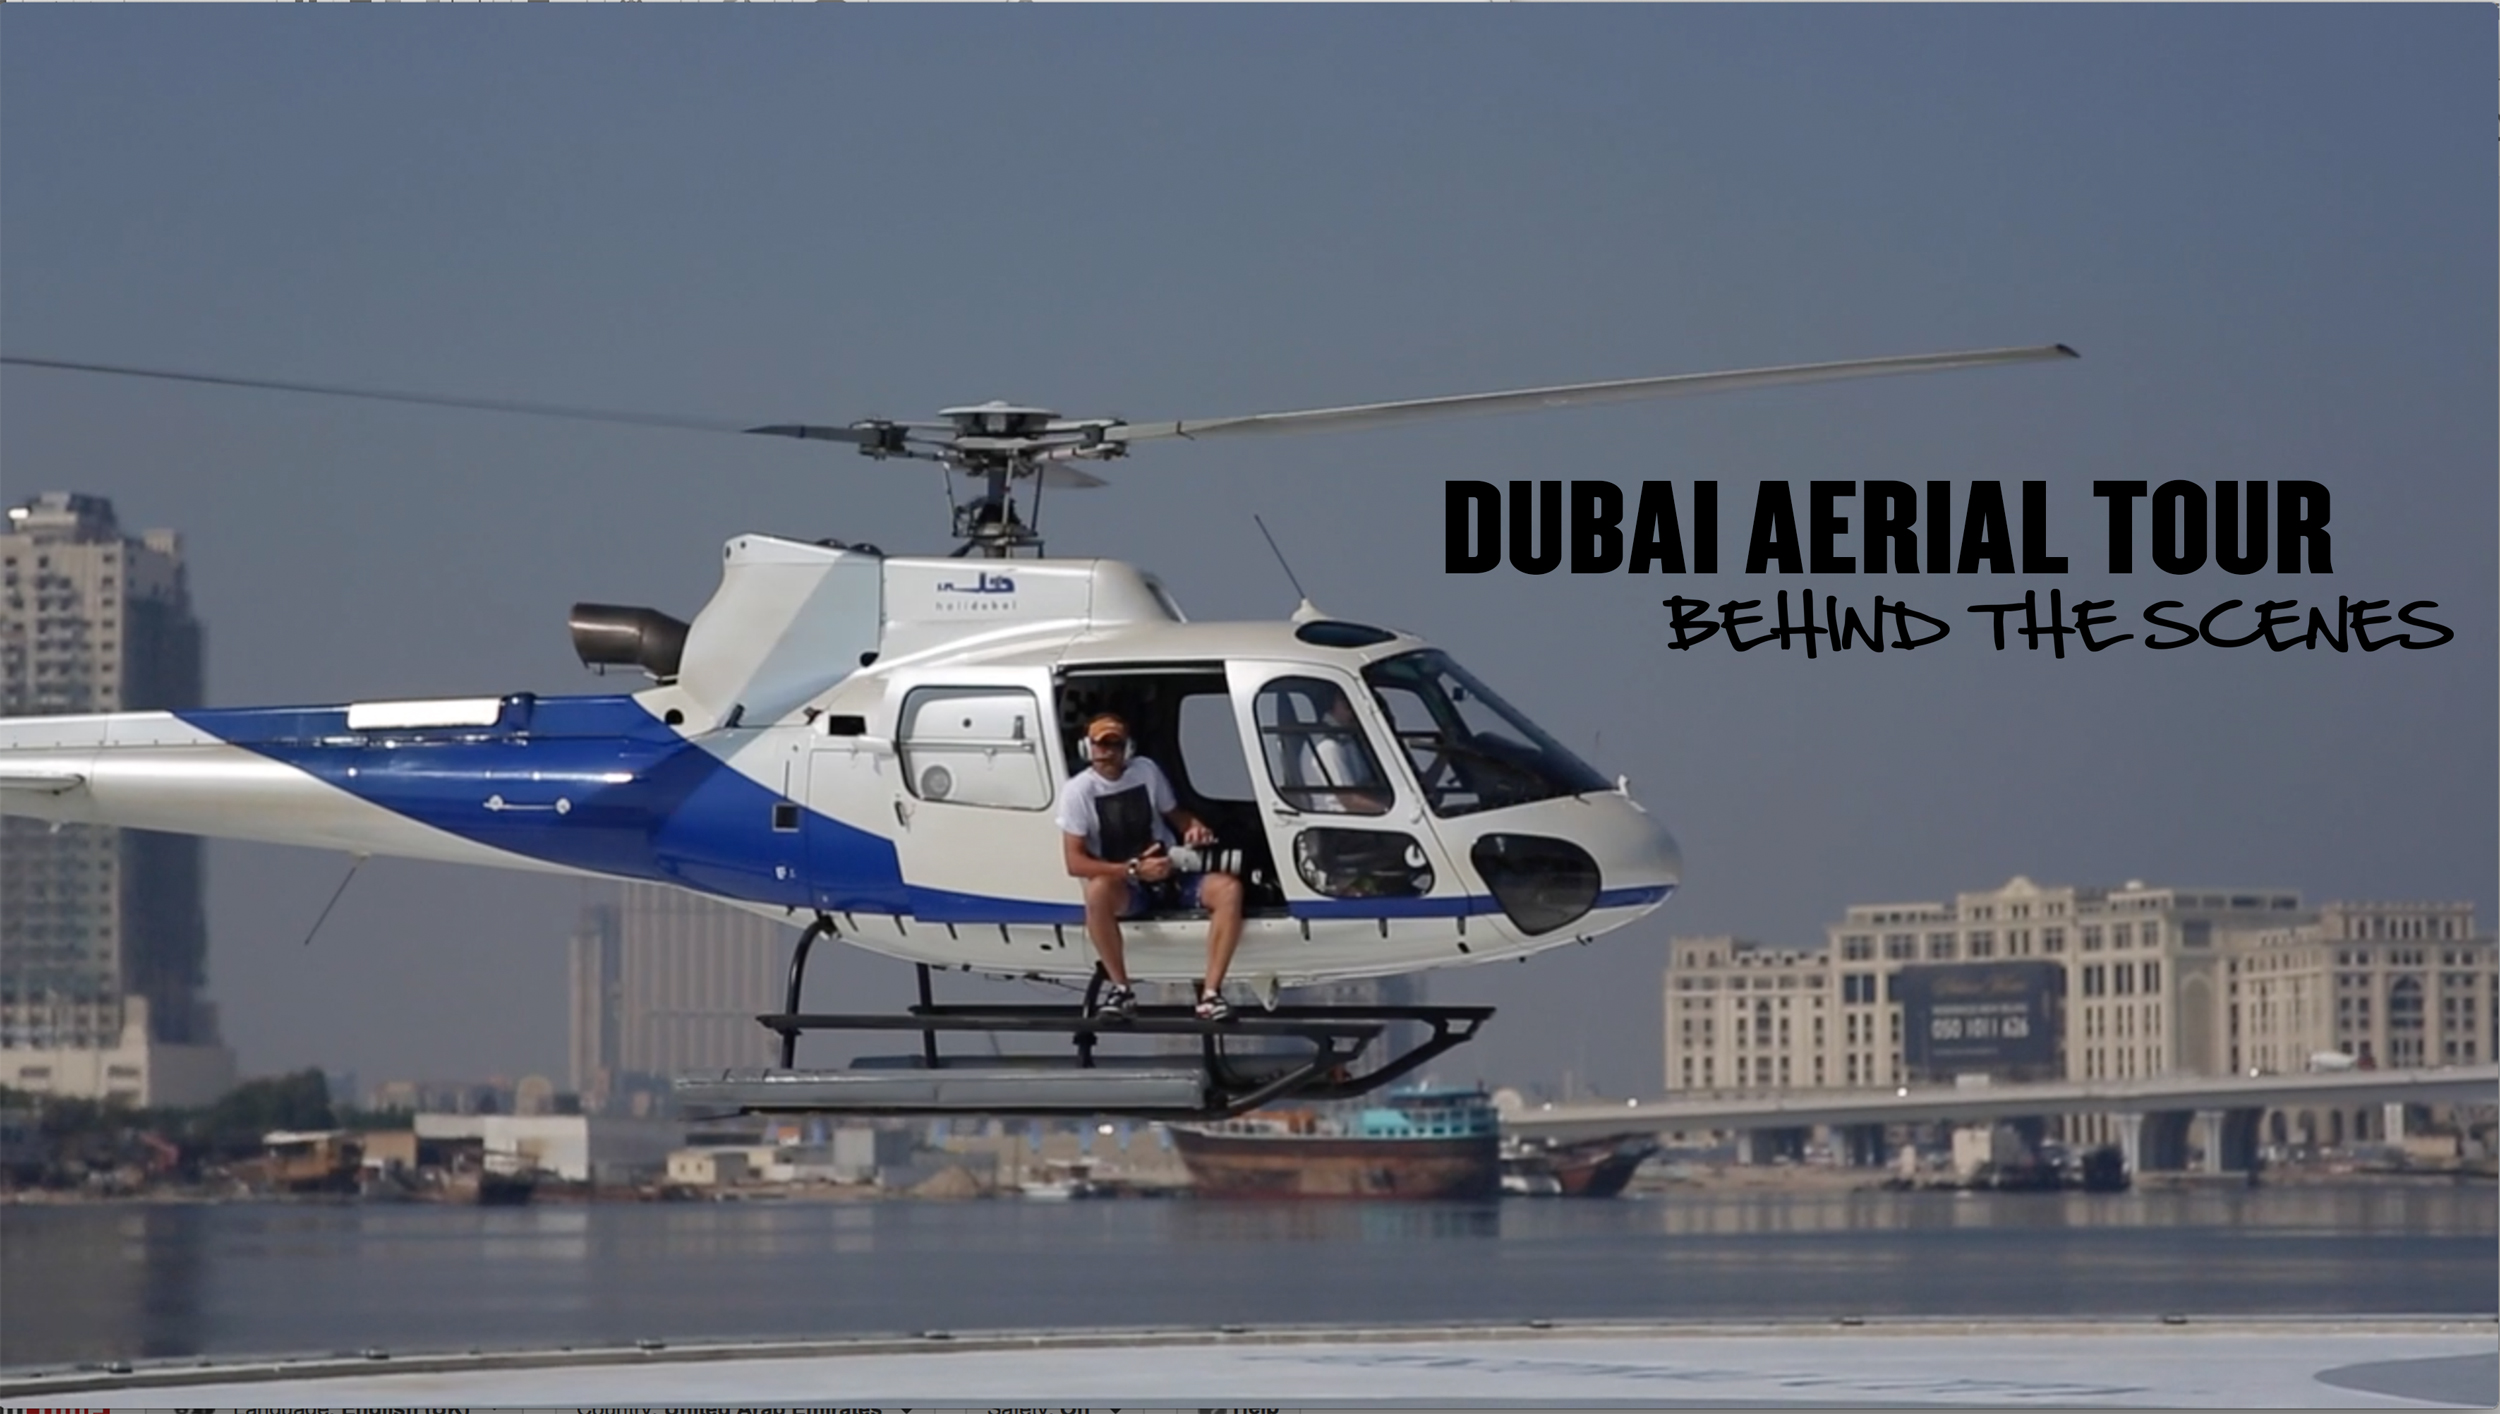 Dubai Aerial Tour Book – launched